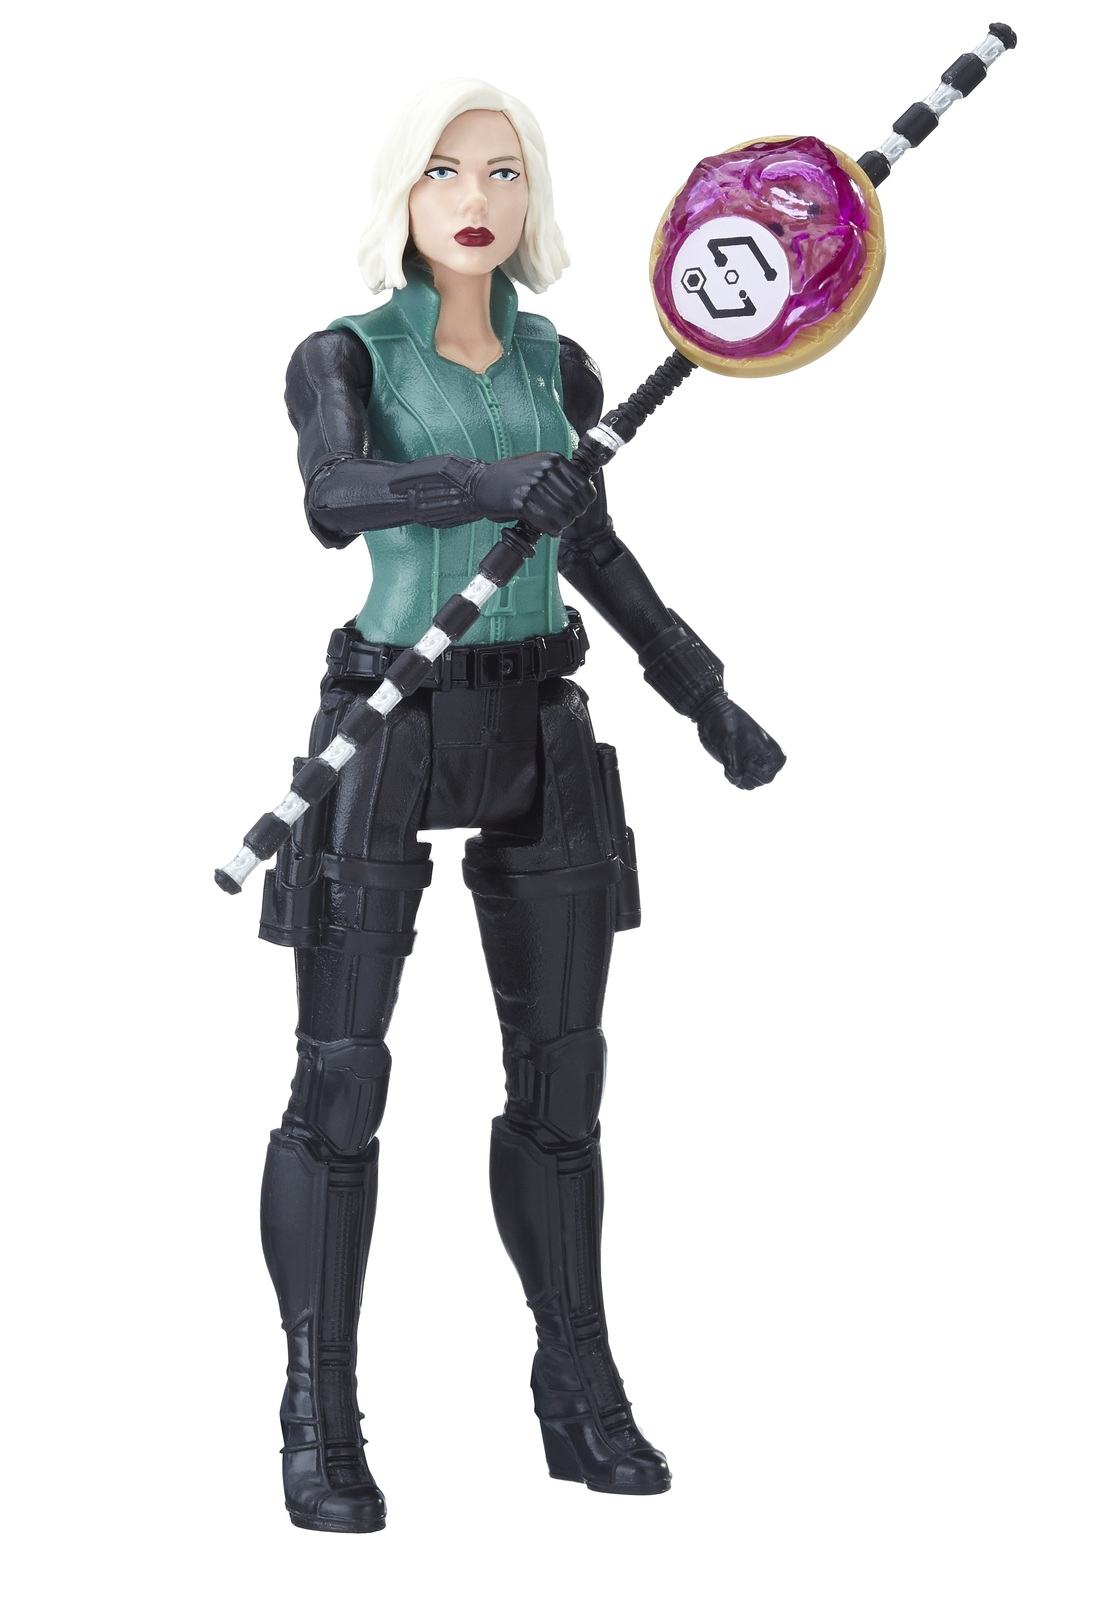 "Avengers Infinity War: Black Widow - 6"" Action Figure image"